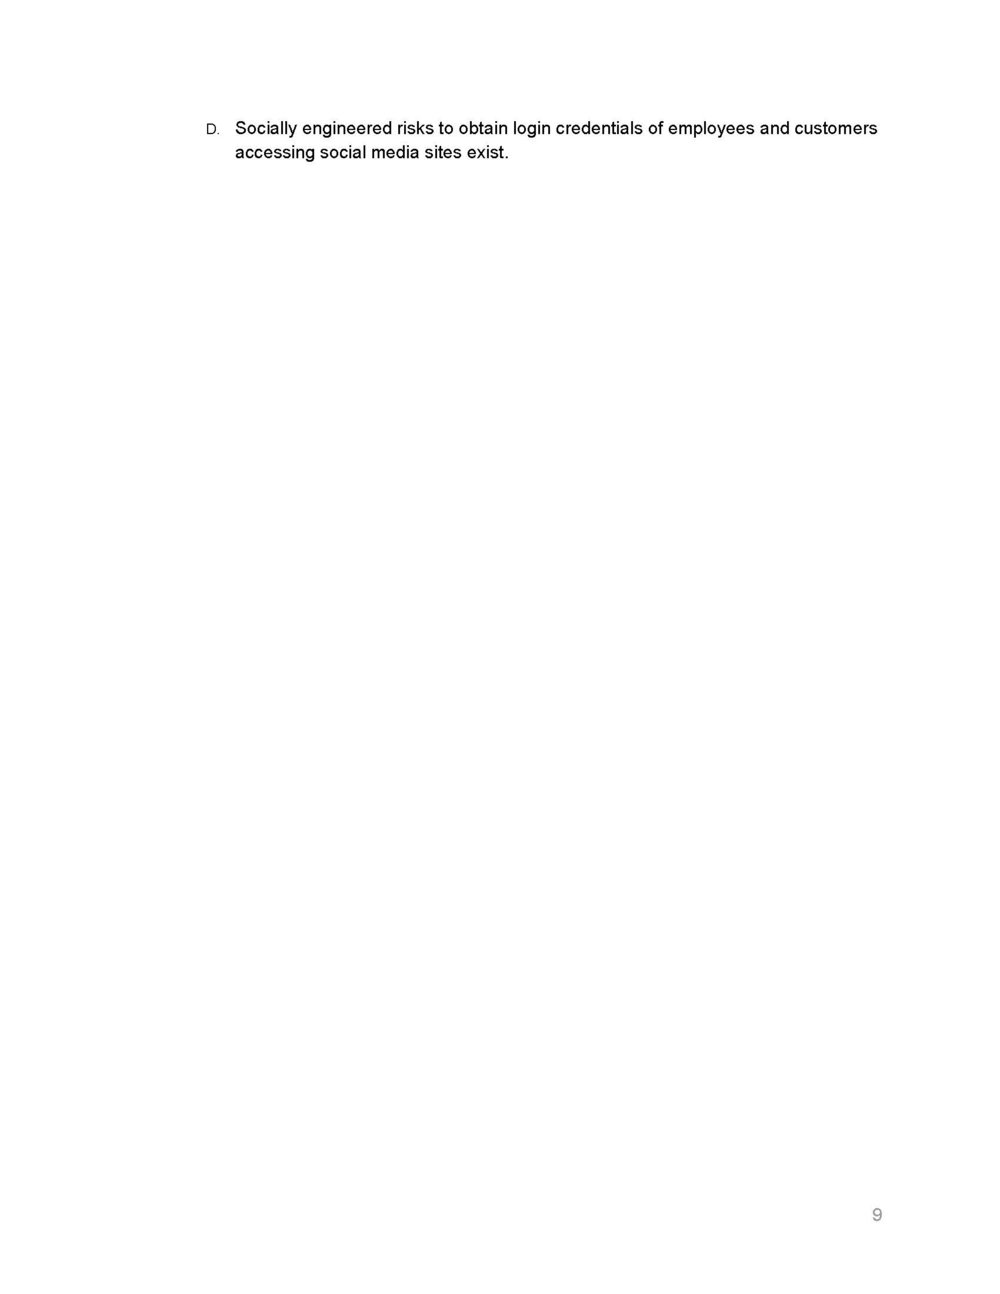 Amity Financial - Social Media White Paper_Page_10.jpg